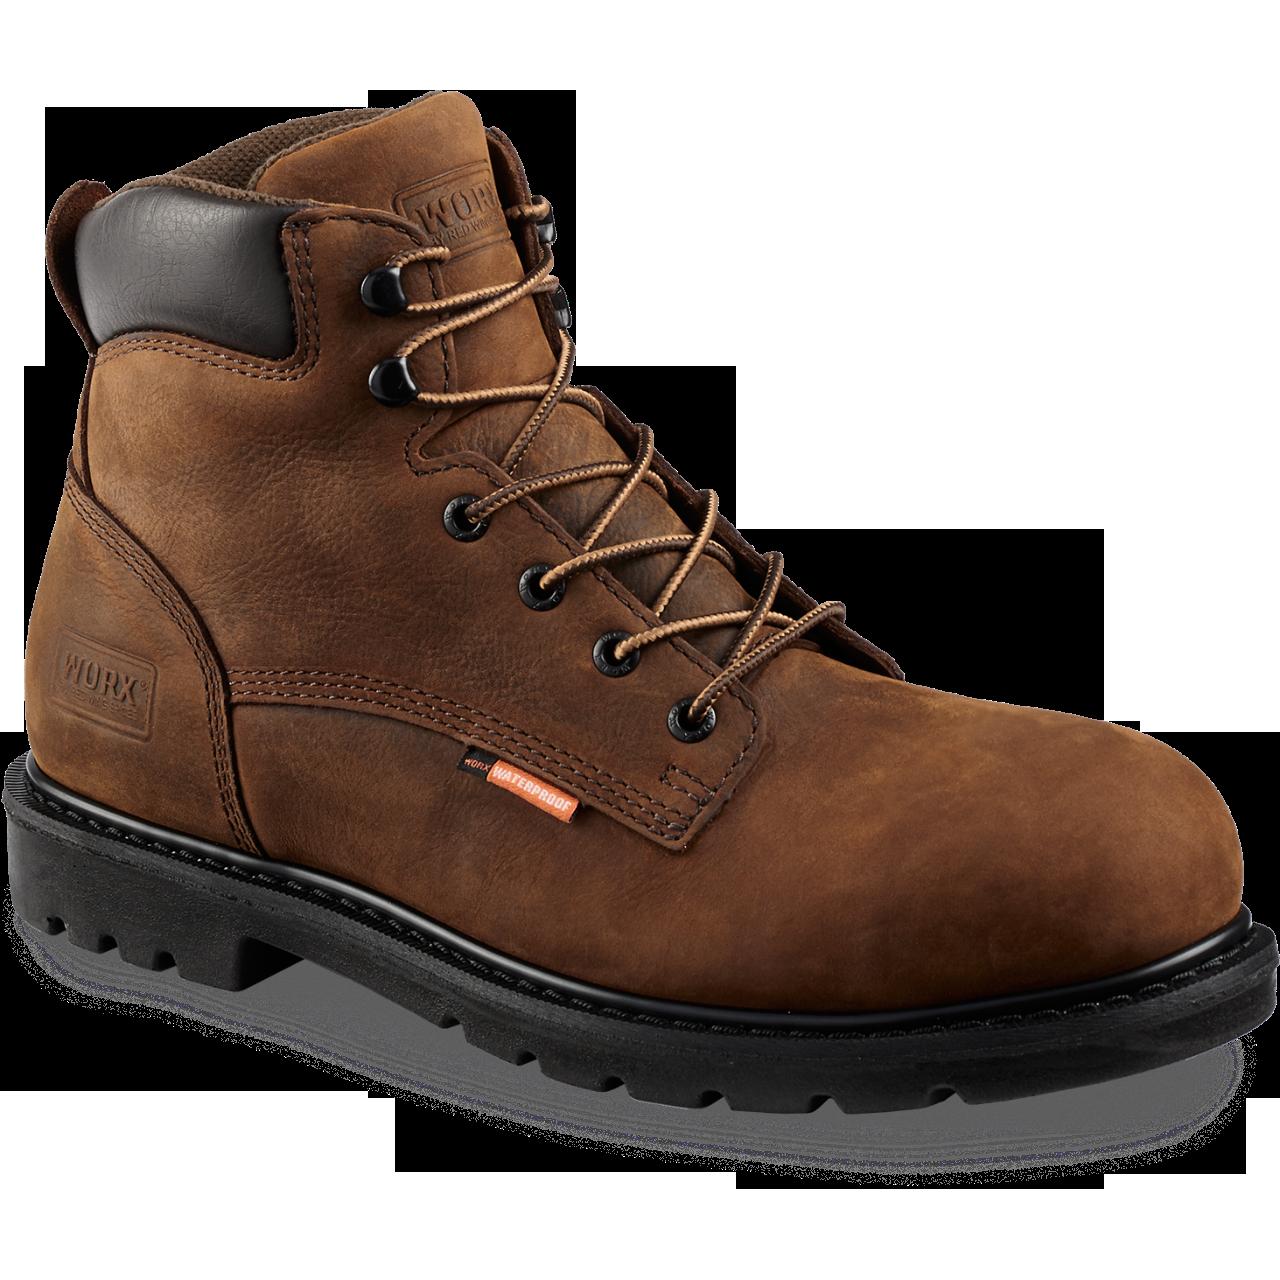 Worx 5606  Steel Toe - Waterproof - Electrical Hazard  Click here for specifications